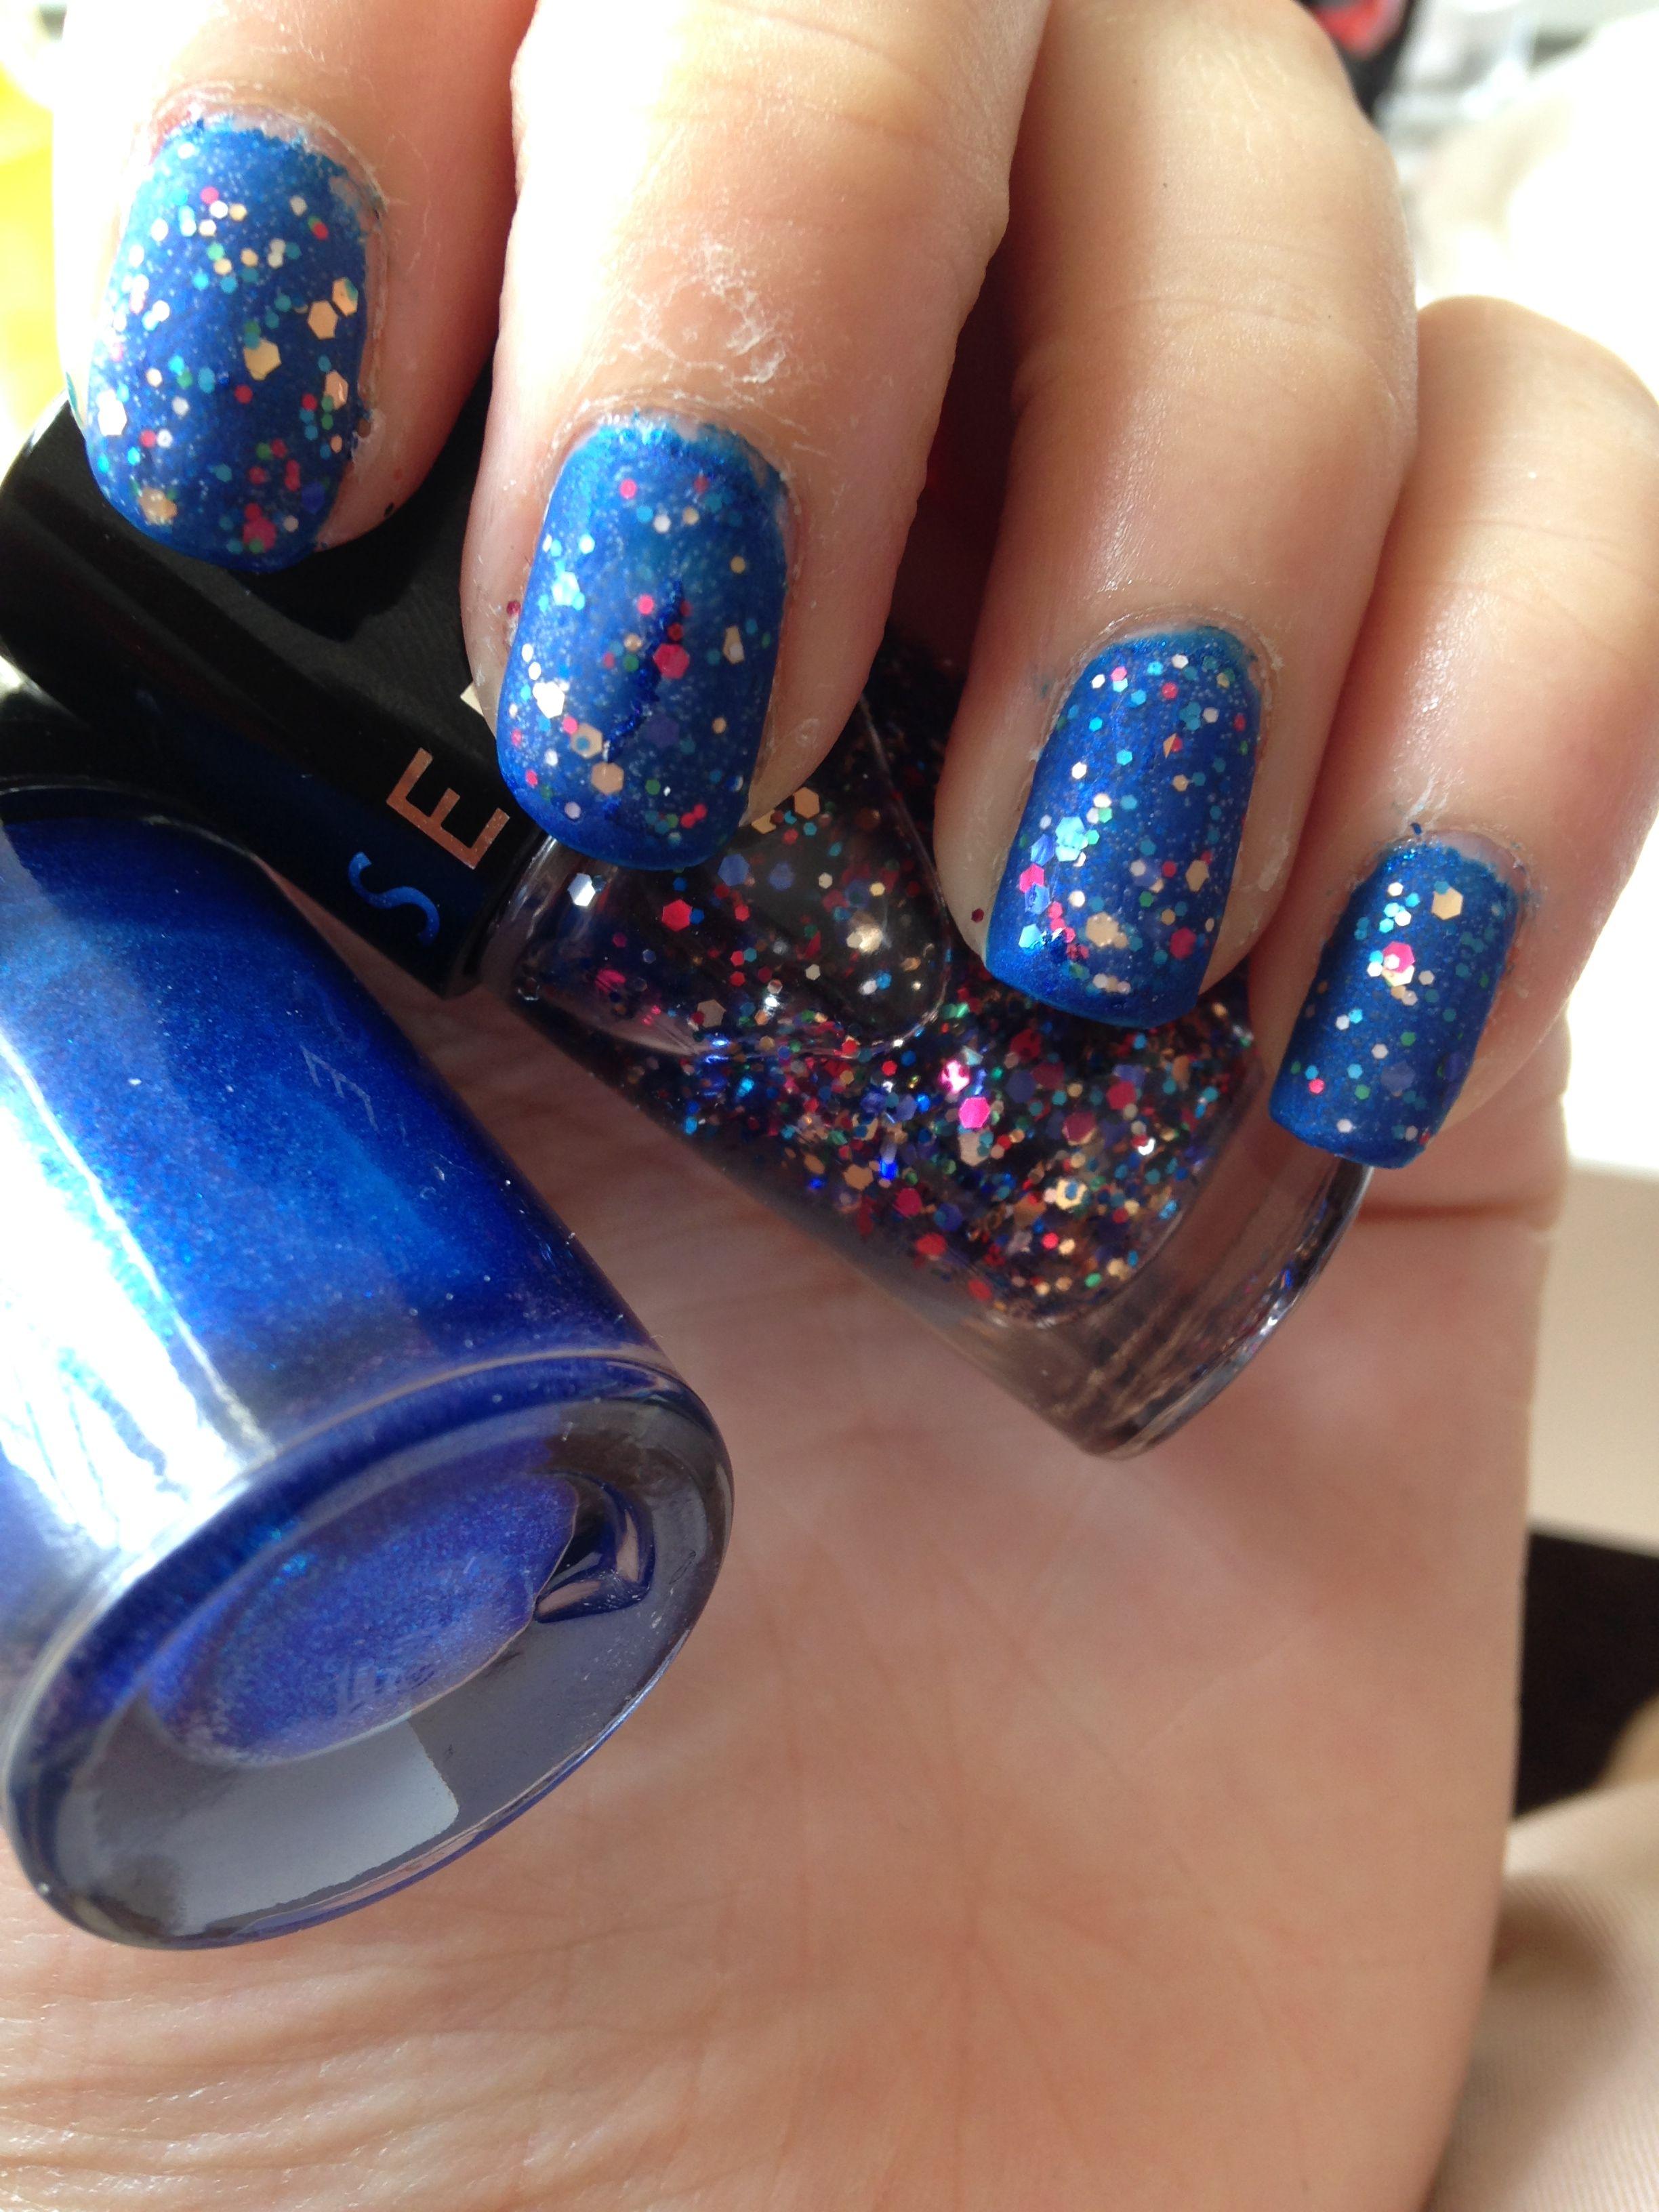 Onlyongles Base Bleue Maybelline Colorshow Ocean Blue 2